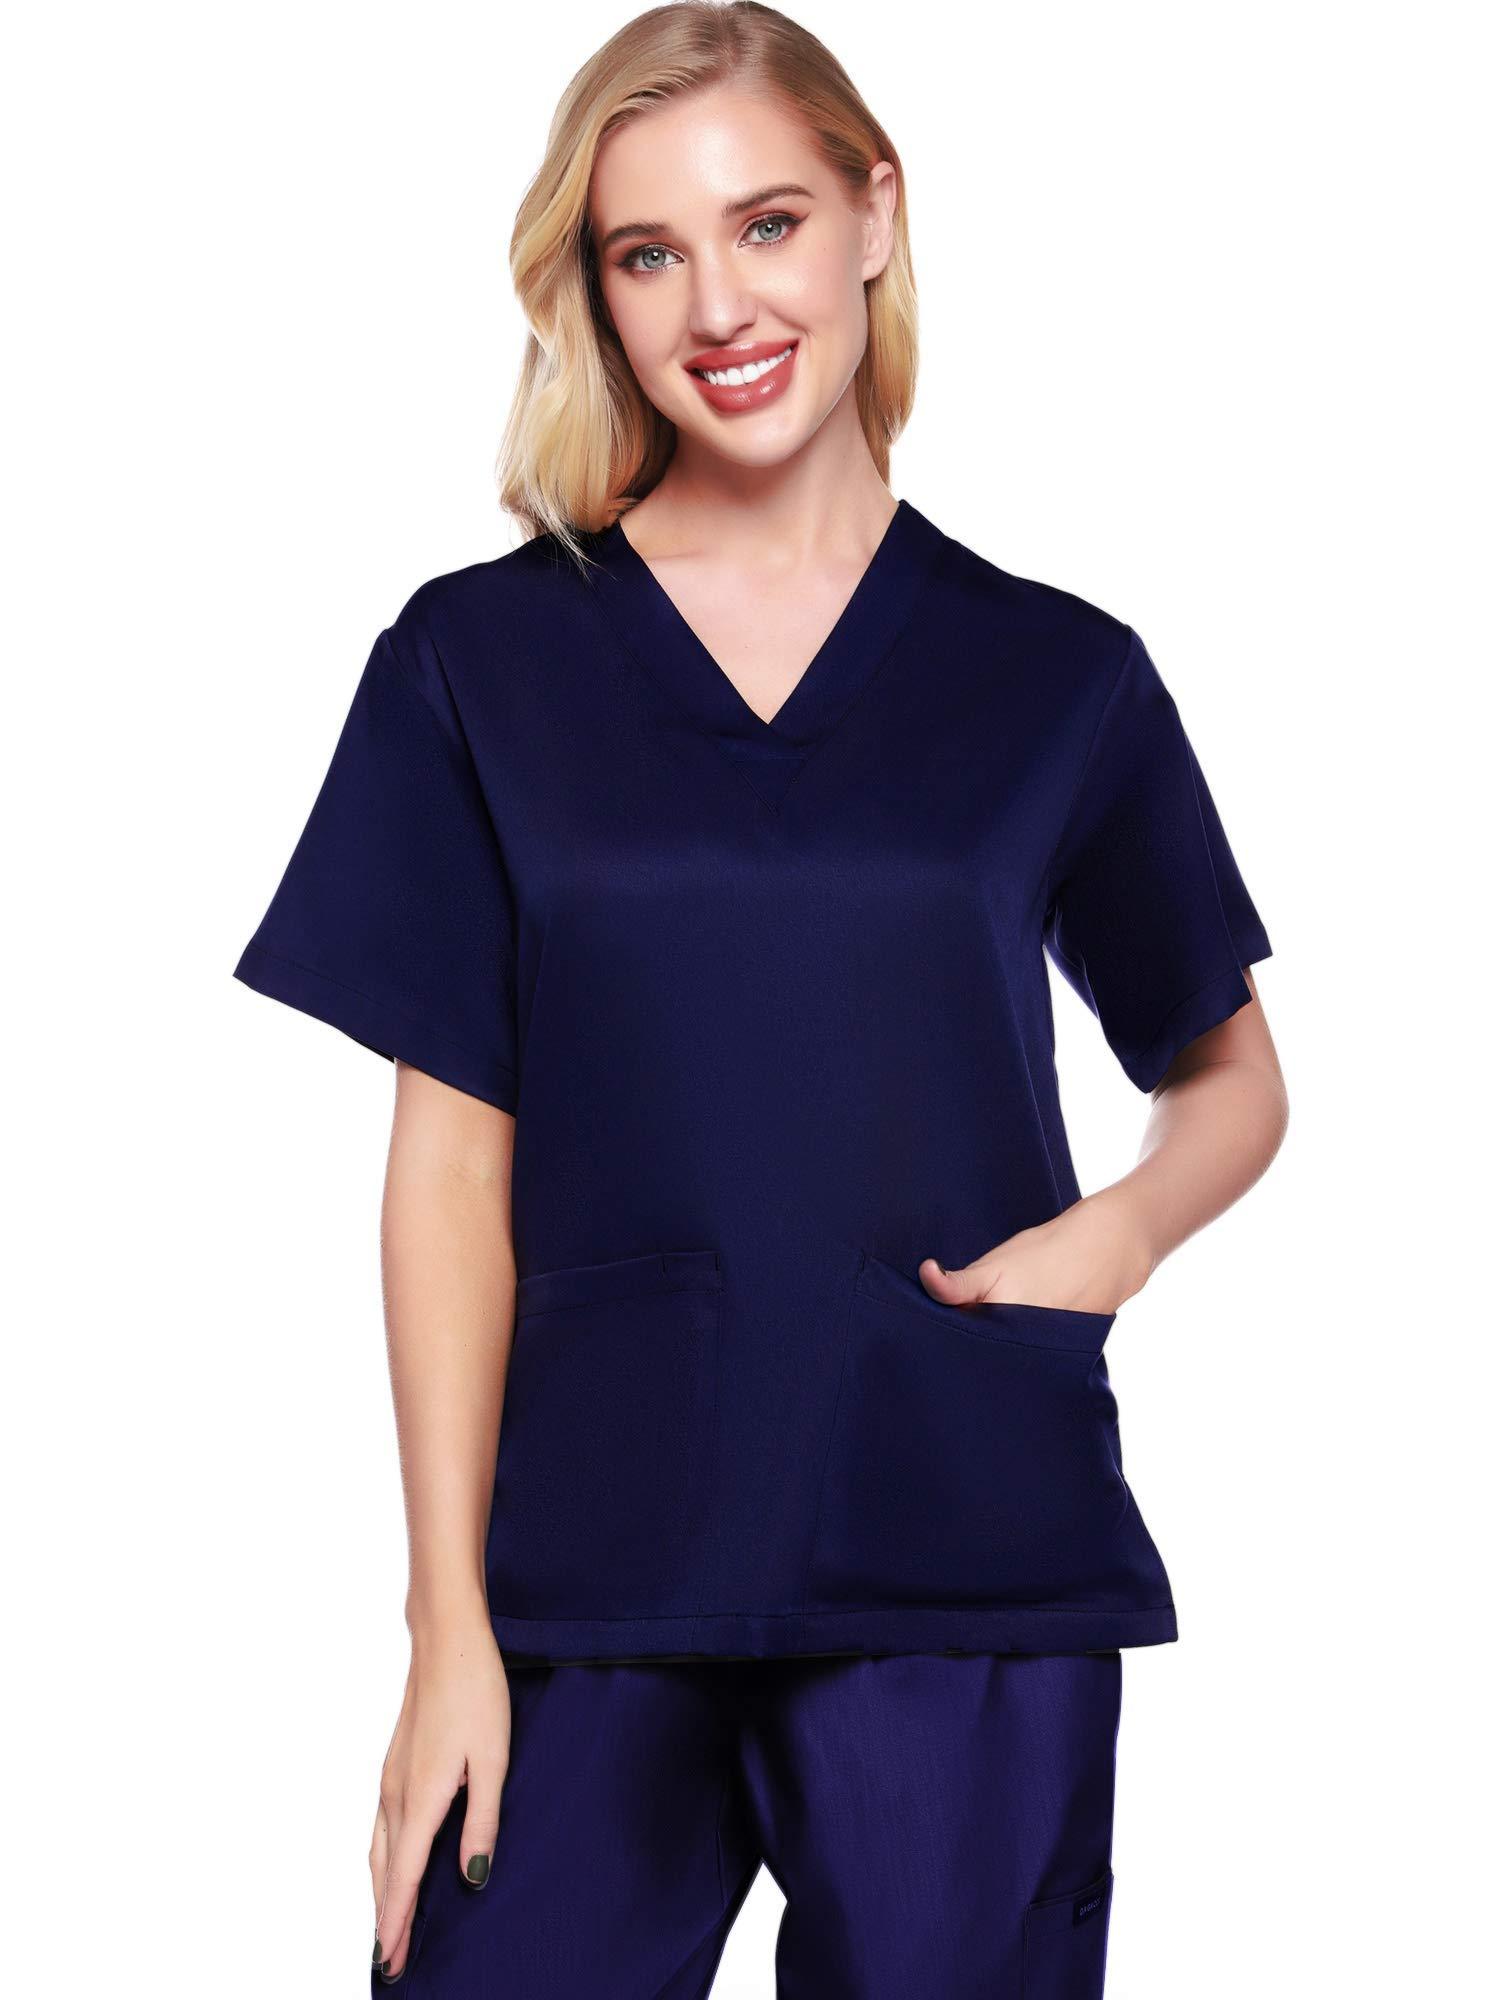 Womens V Neck Solid Short Sleeve Scrub Top Work Uniform Shirt with Pockets (Navy L)